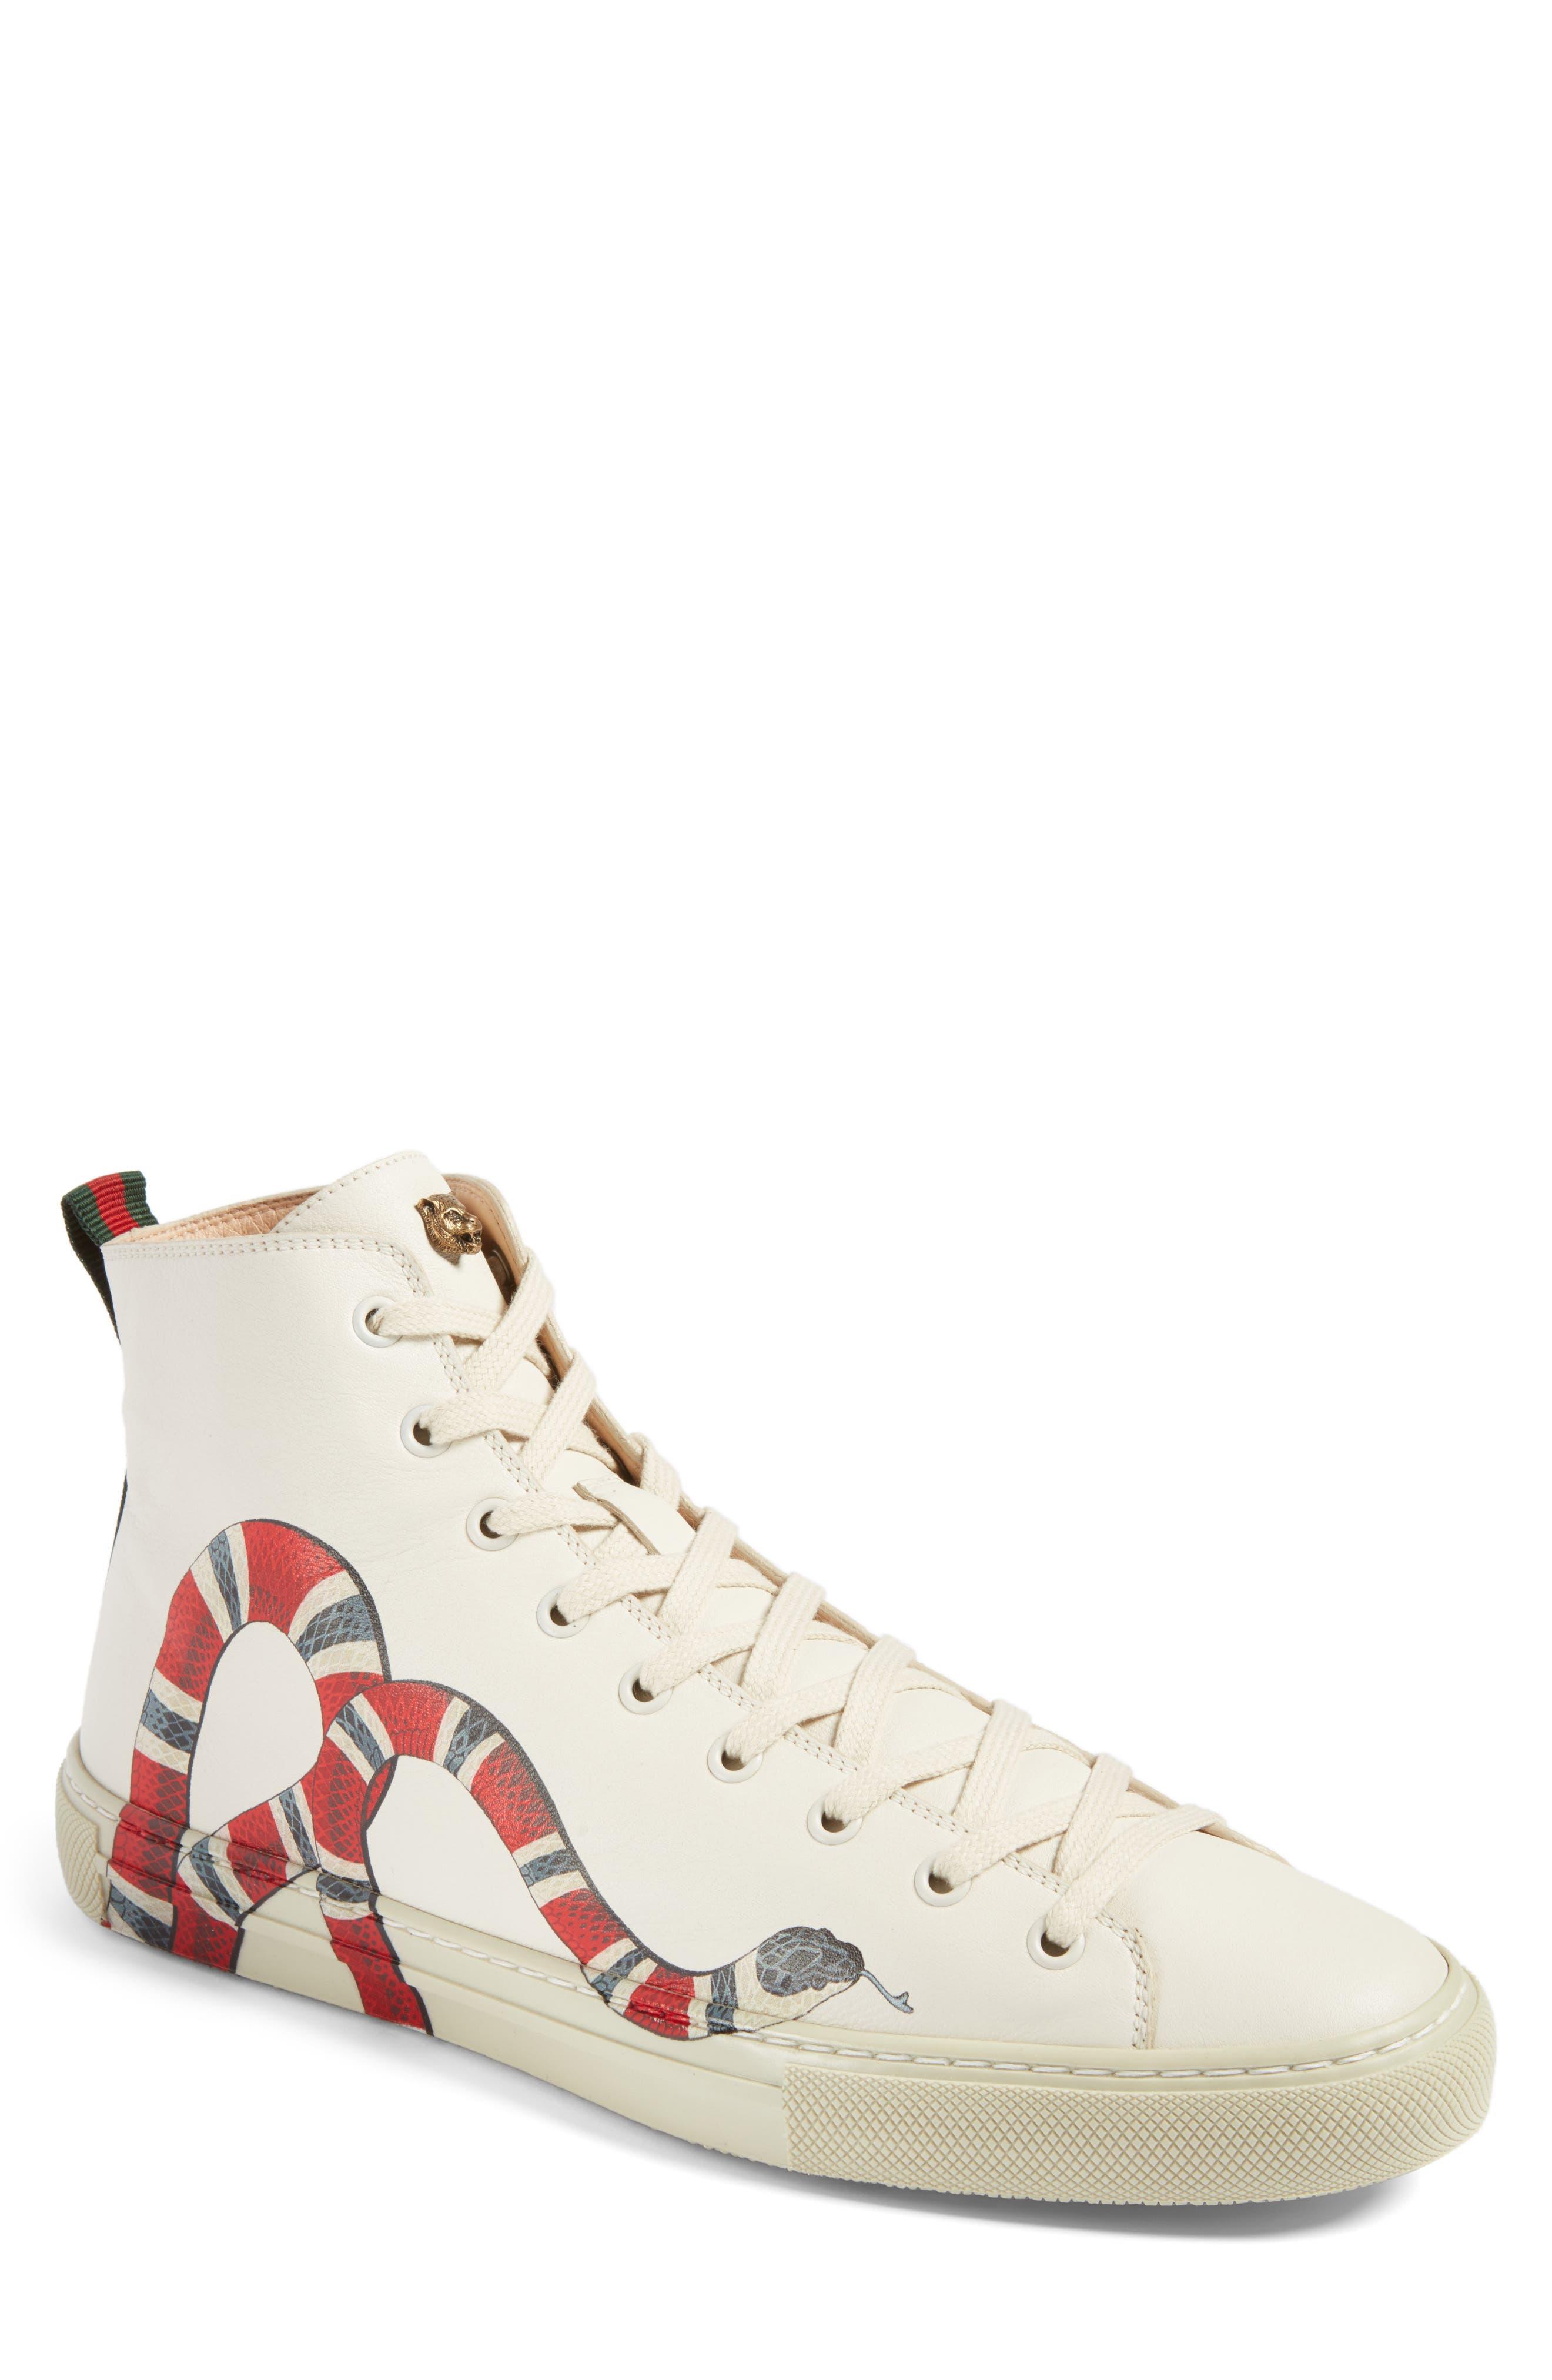 gucci shoes white. gucci major high top sneaker (men) shoes white e